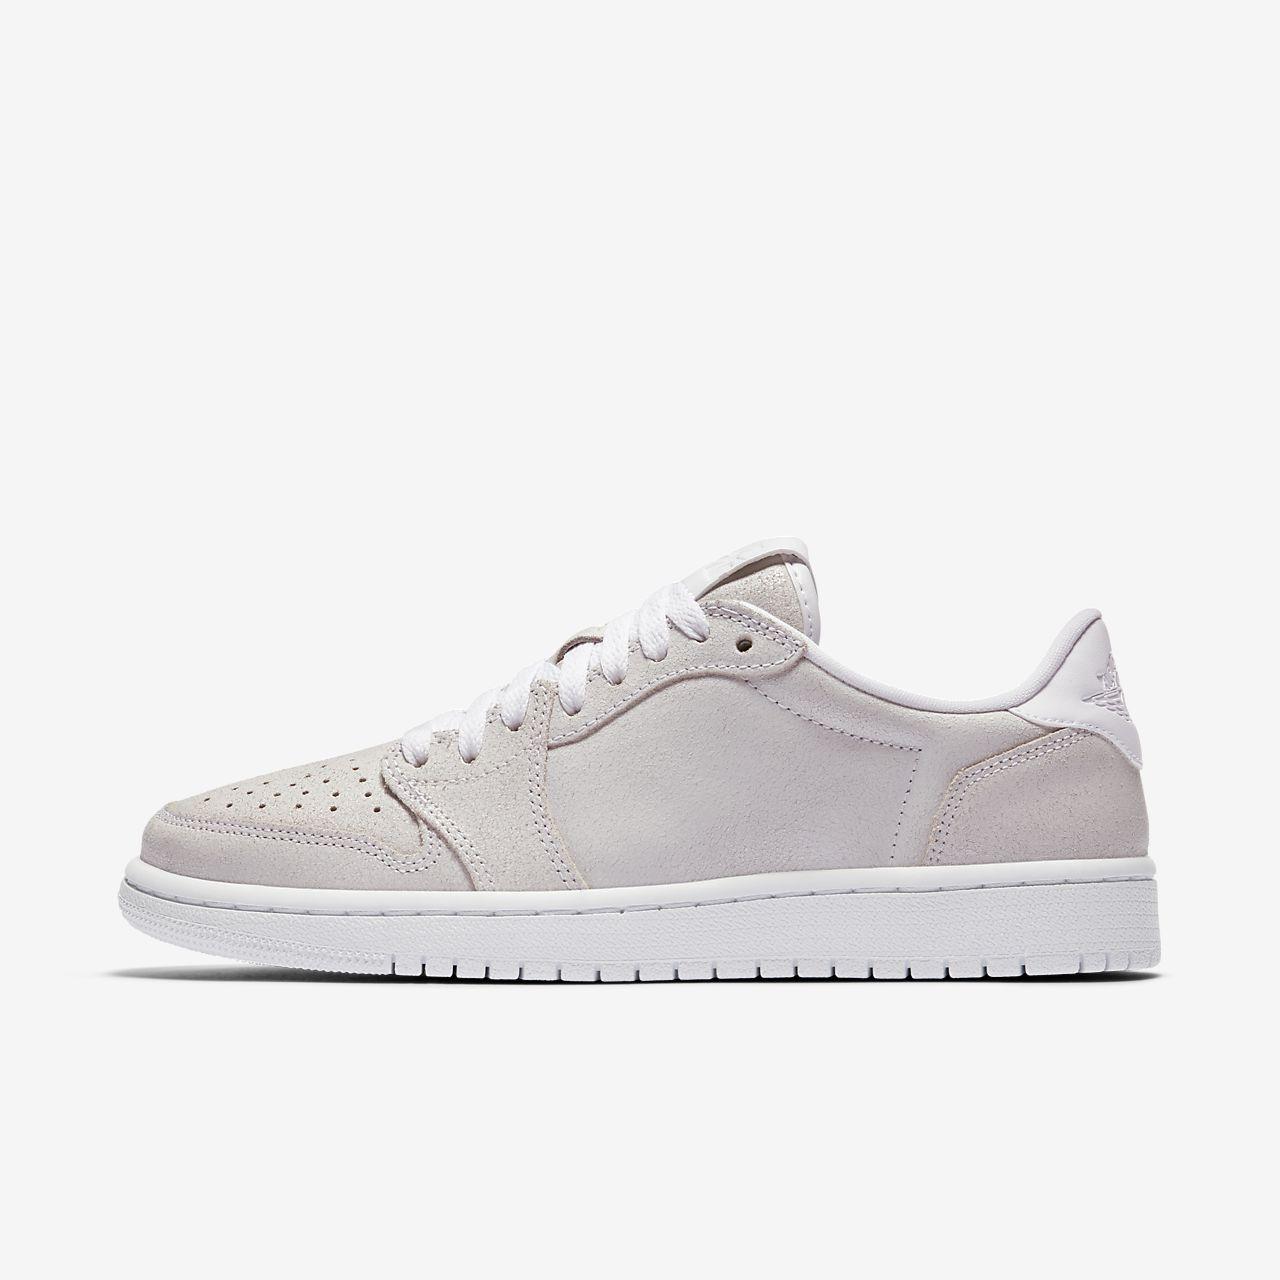 Nike Wmns Air Jordan 1 Retro Low Ns Air Jordans 1 Retro Womens ... 4b0a377474